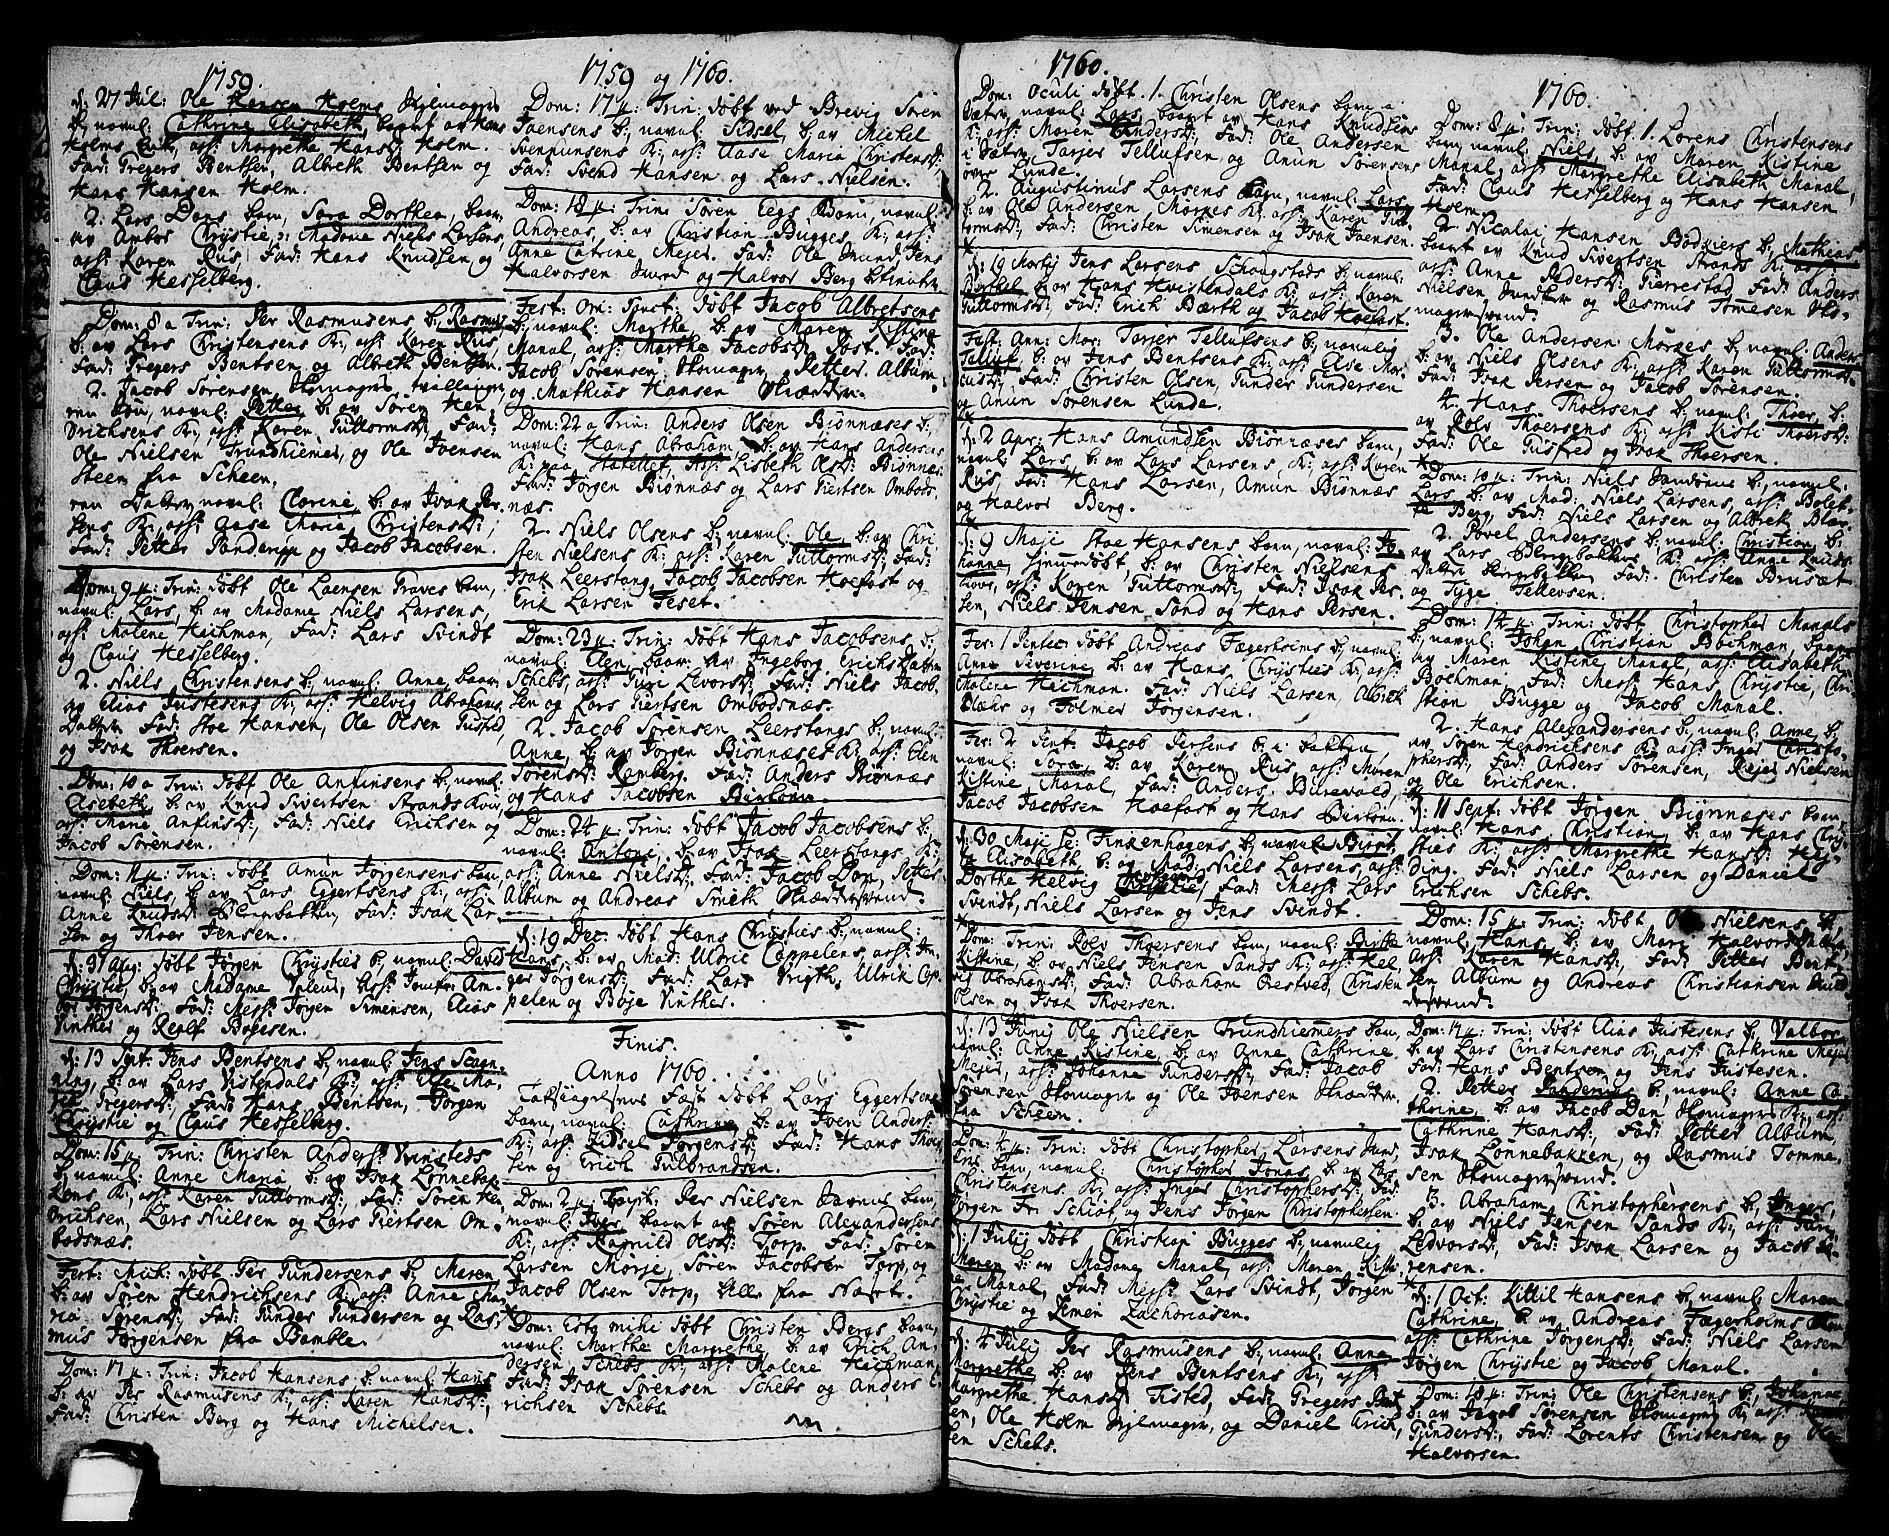 SAKO, Brevik kirkebøker, F/Fa/L0002: Ministerialbok nr. 2, 1720-1764, s. 35g